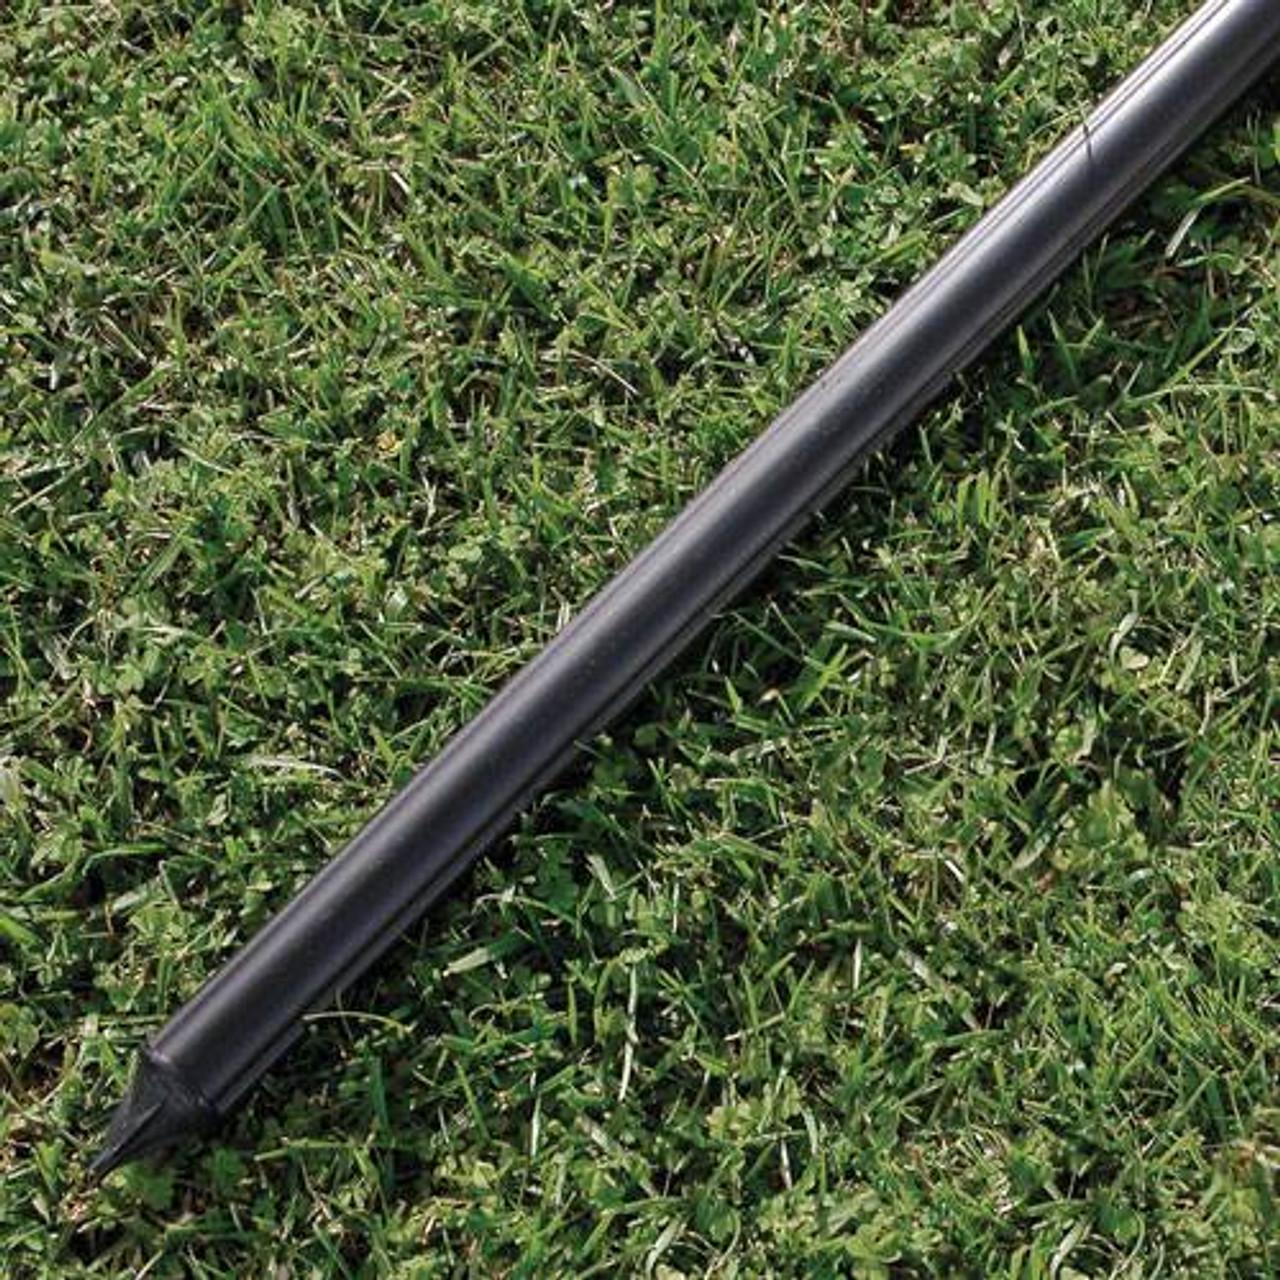 Enduro Flexible Pole Only - 16 per set